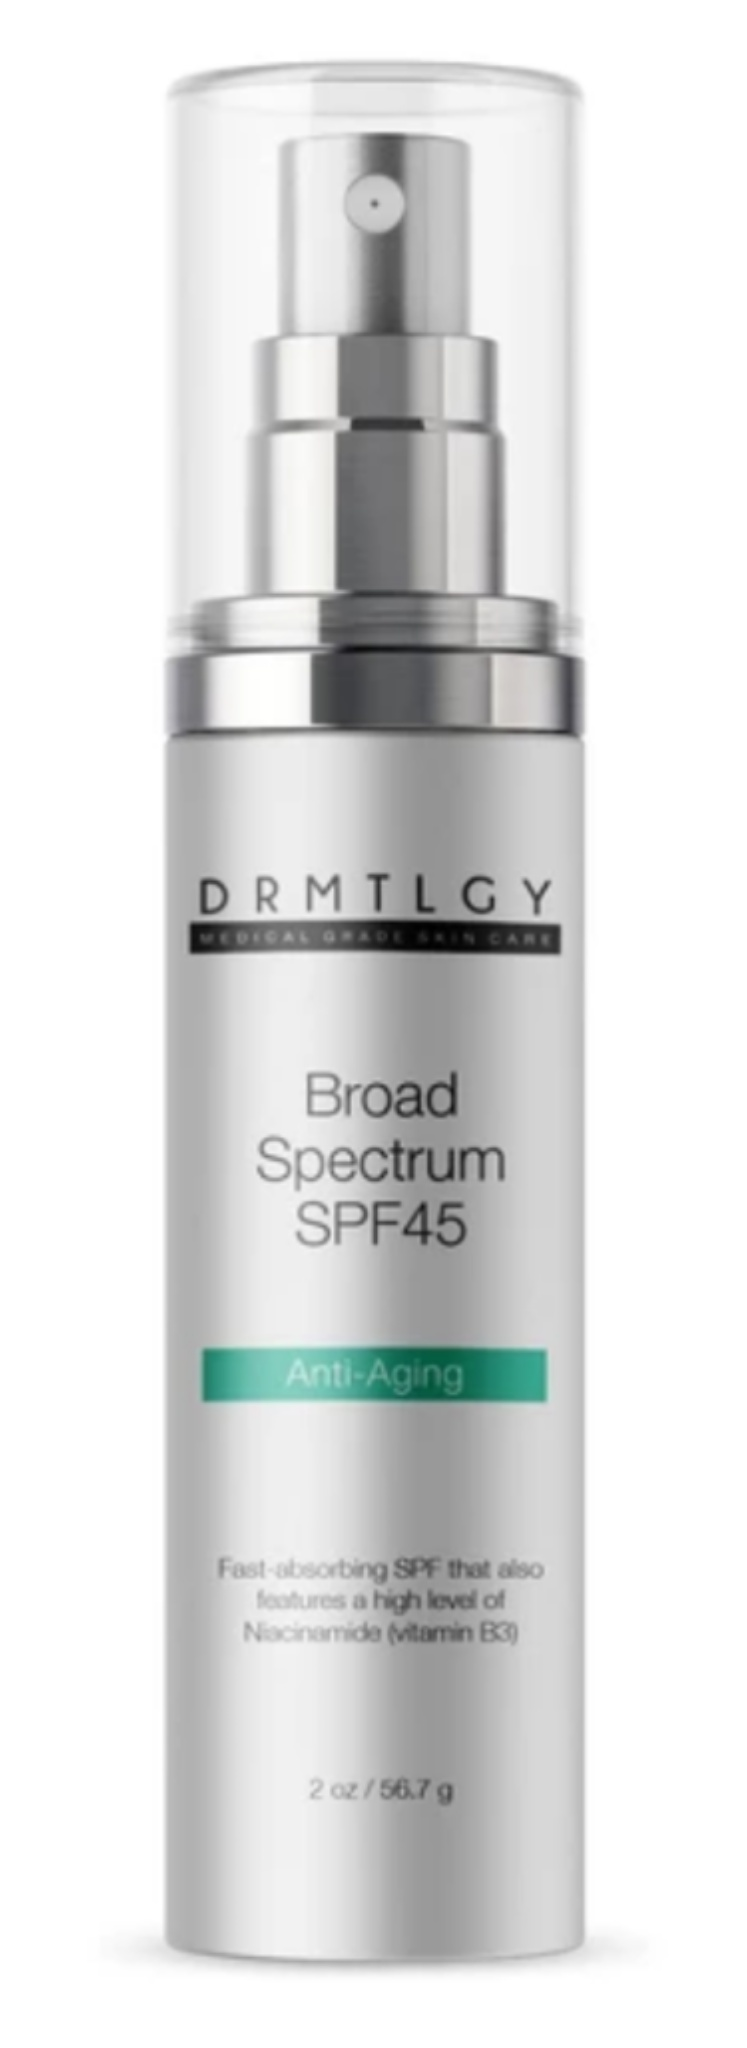 DRMTLGY Broad Spectrum Spf 45